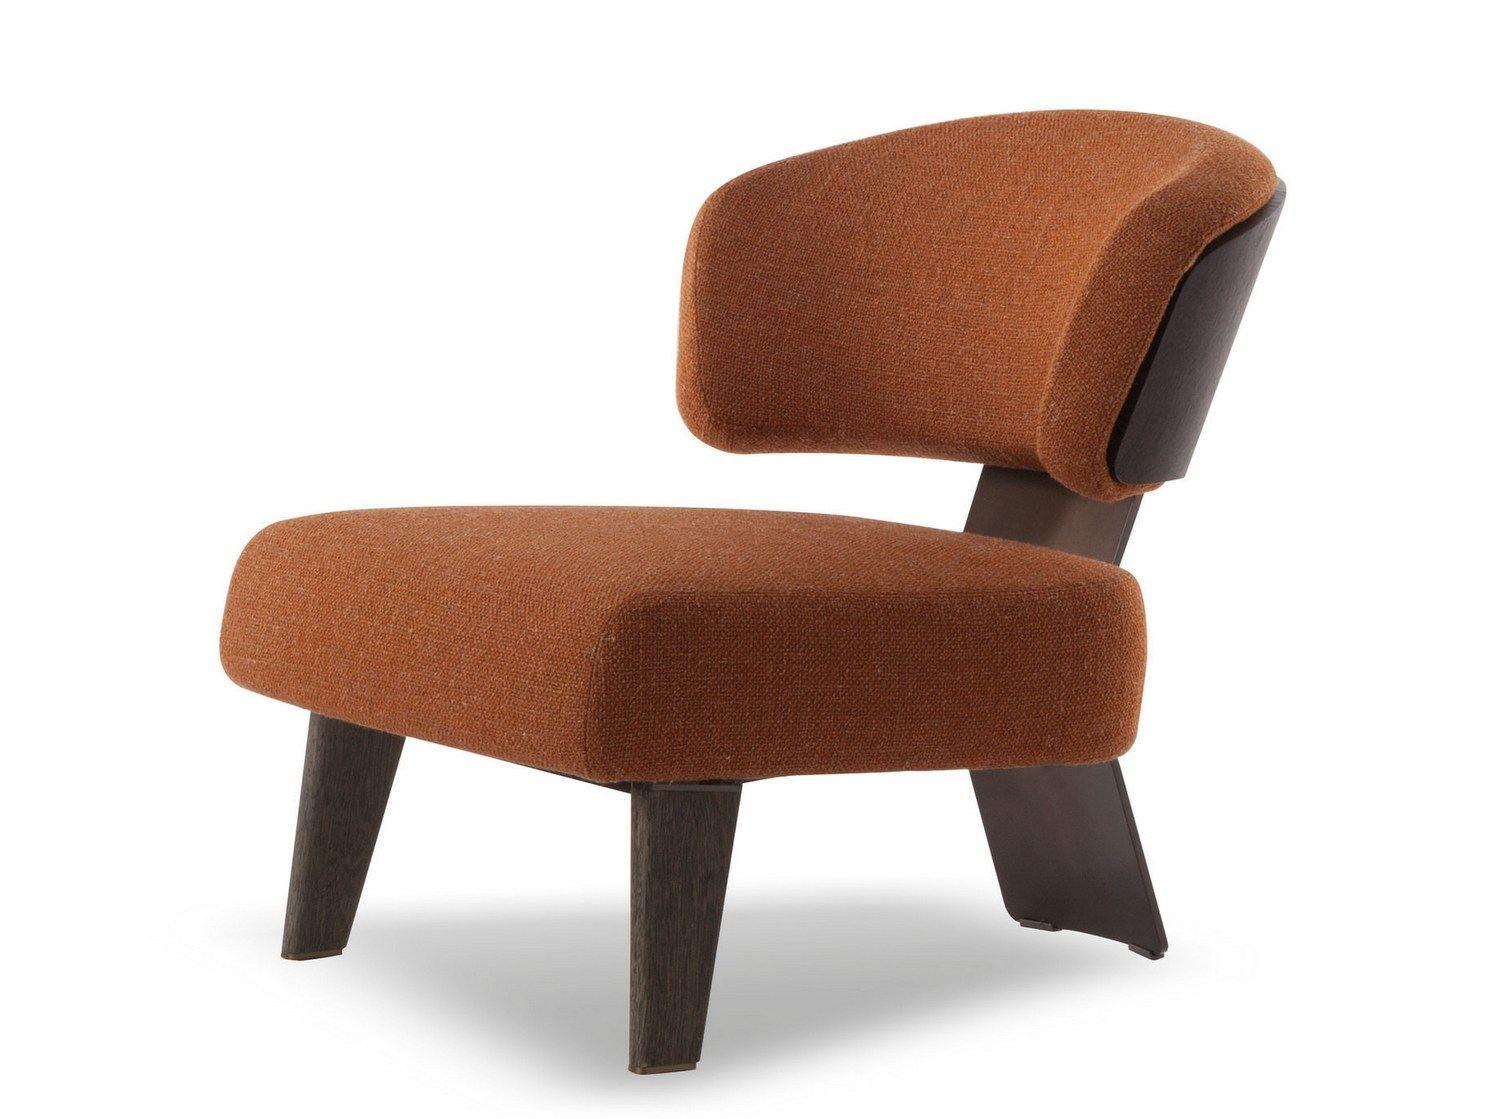 Petit fauteuil creed wood by minotti design rodolfo dordoni - Petits fauteuils design ...